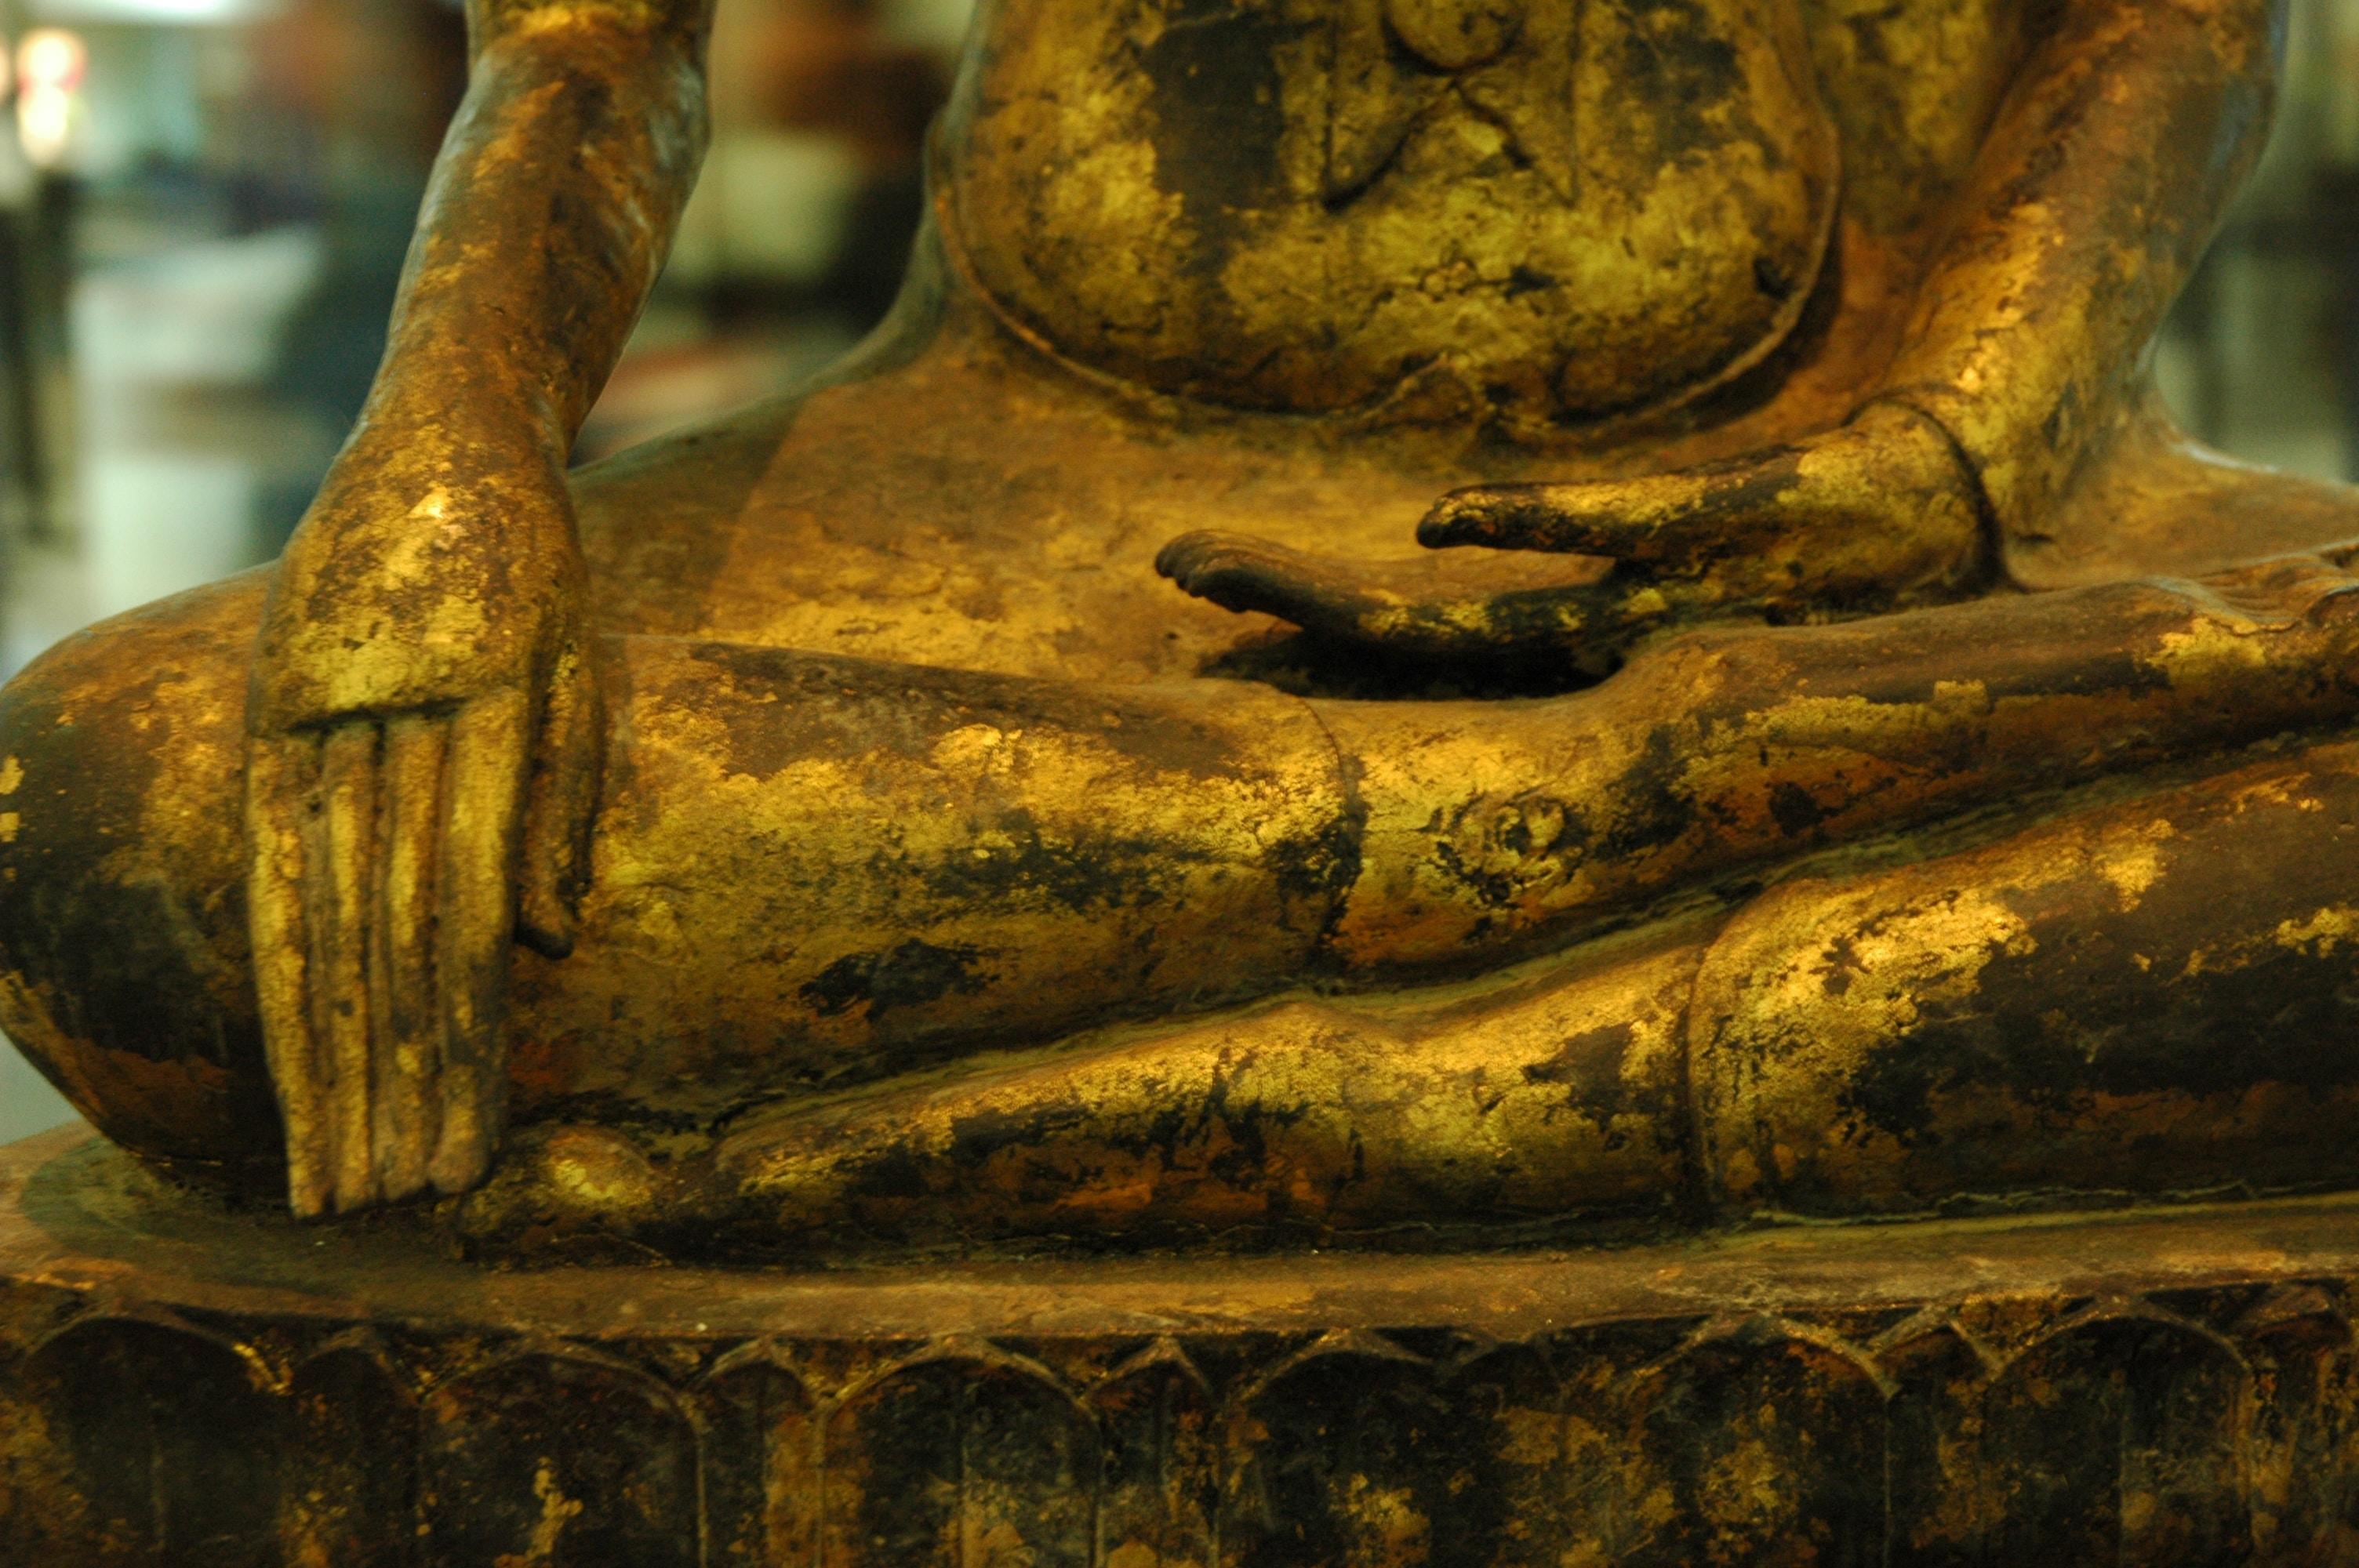 Buddhism is Realism : Buddhism 101 - Episode 36 Photo by Wonderlane on Unsplash